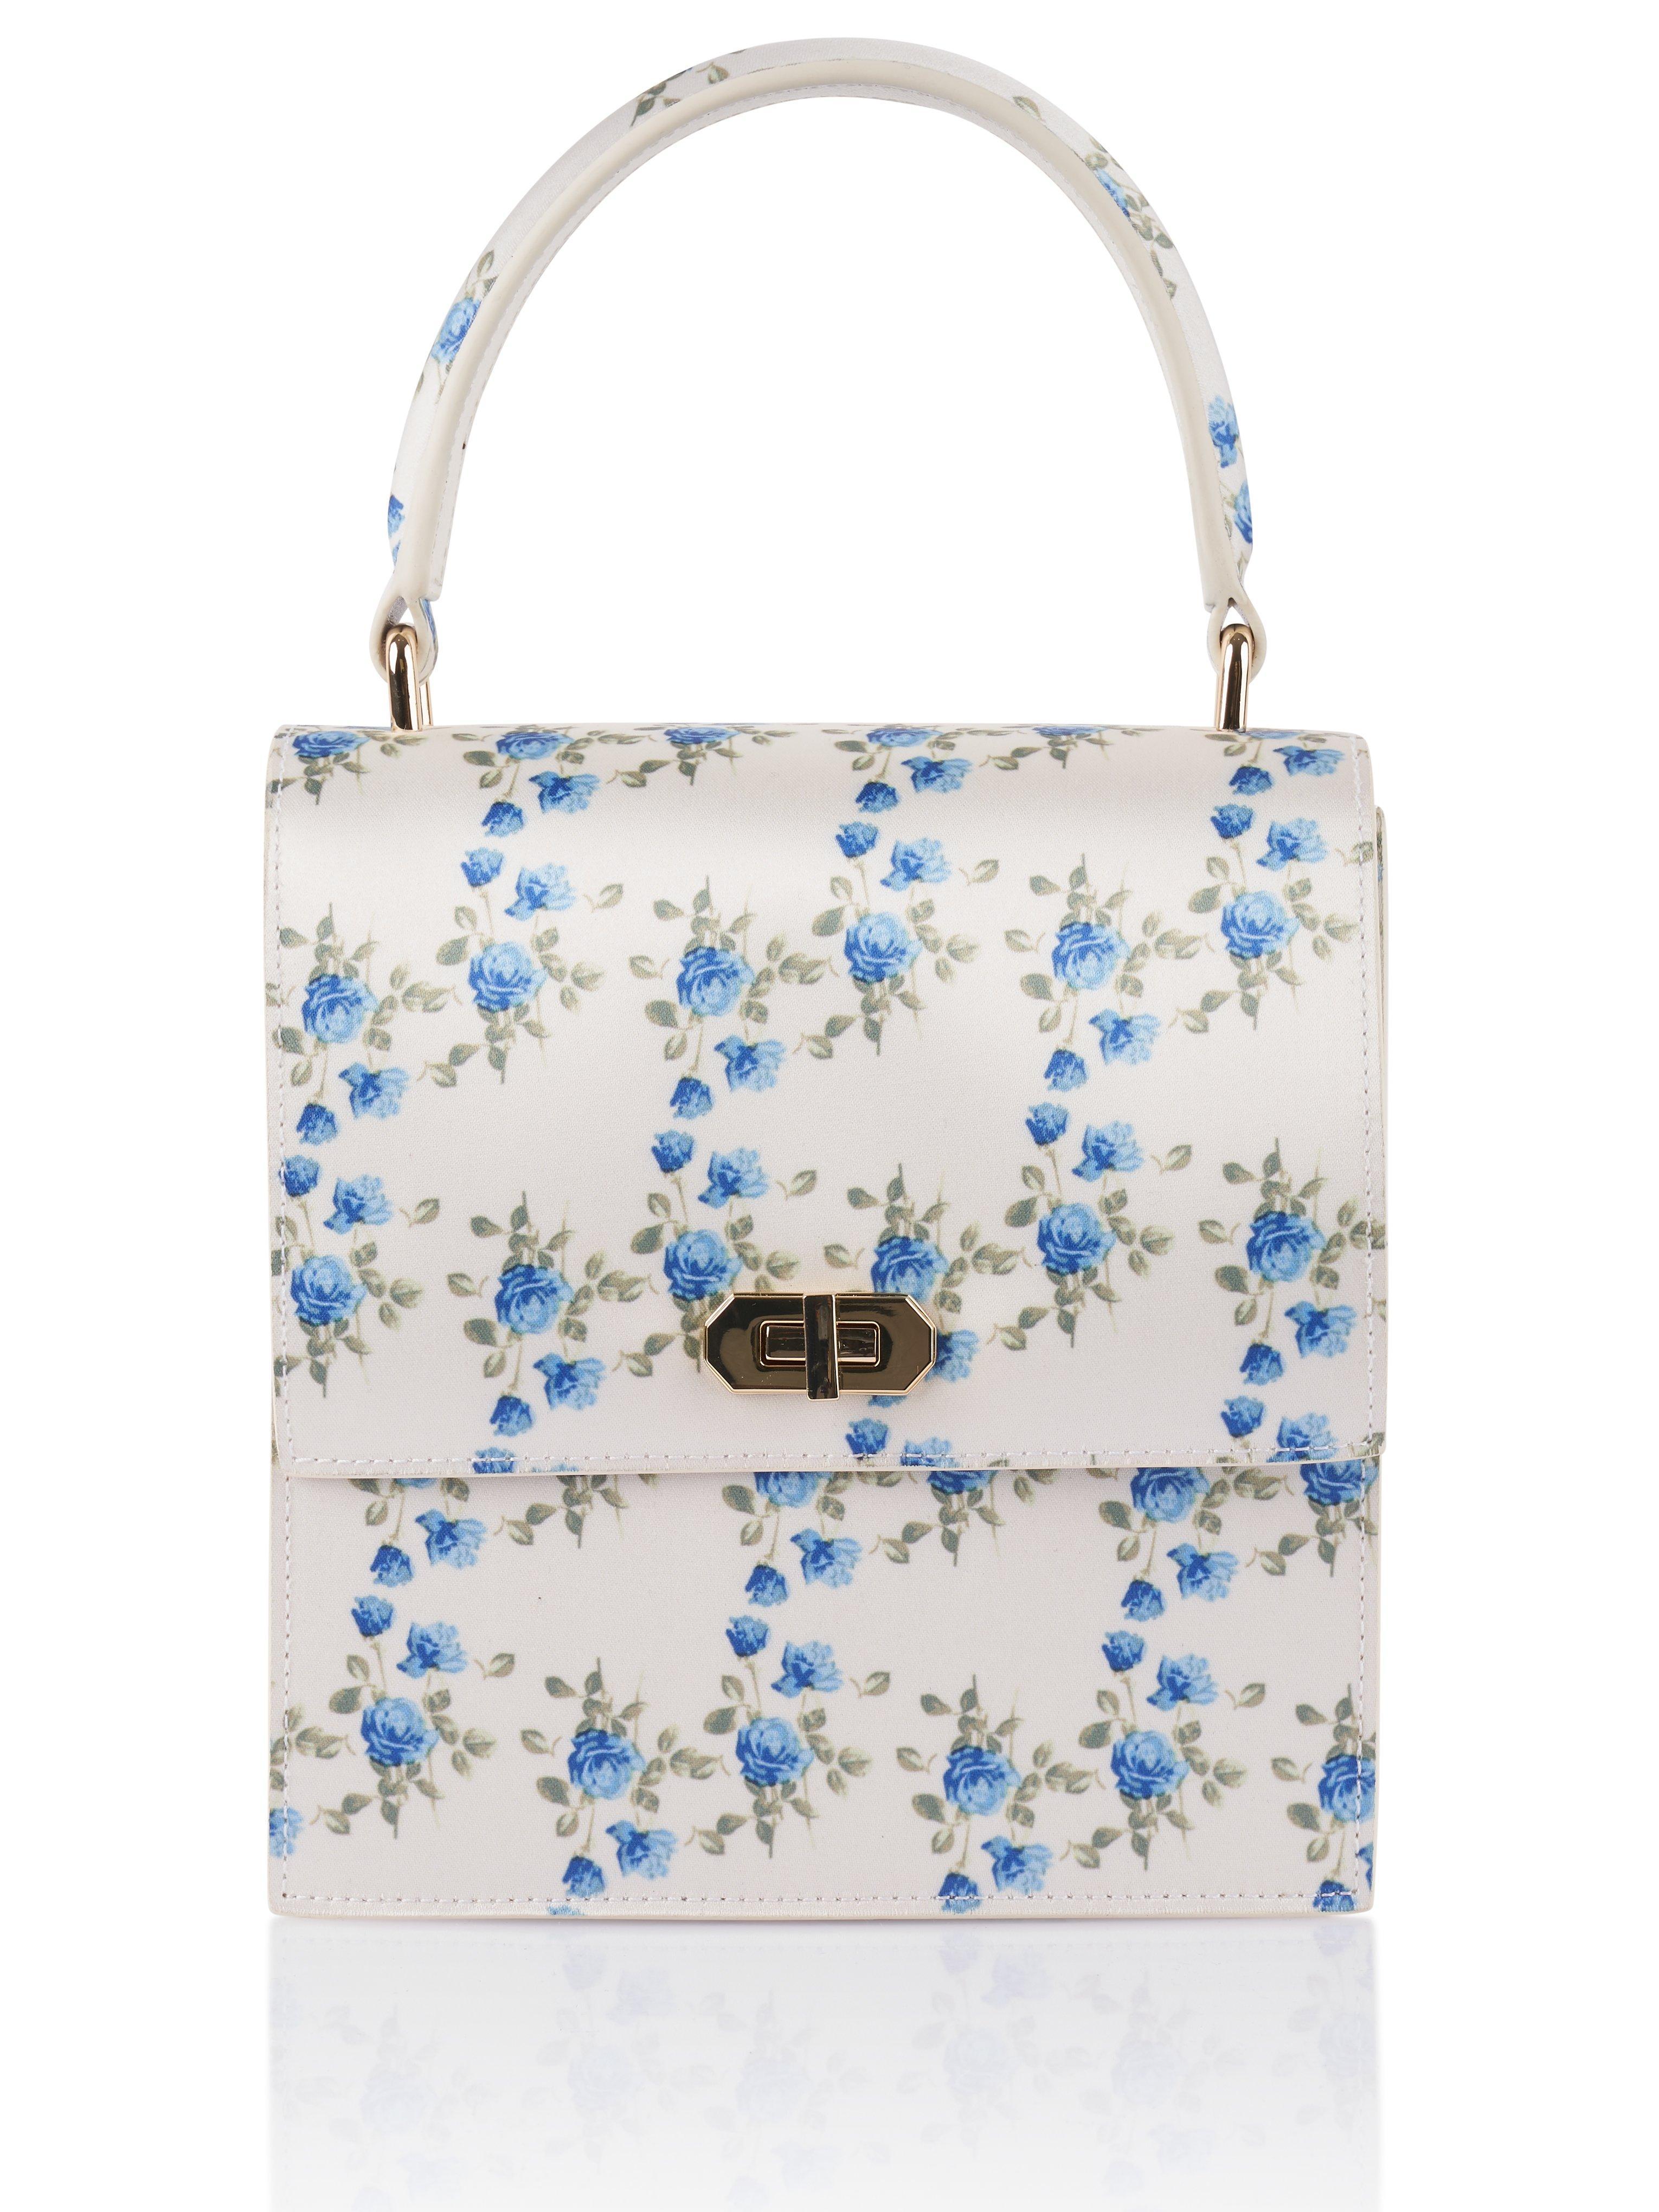 9d0277a4f NEELY & CHLOE Mini Satin Lady Bag in Blue - Lyst